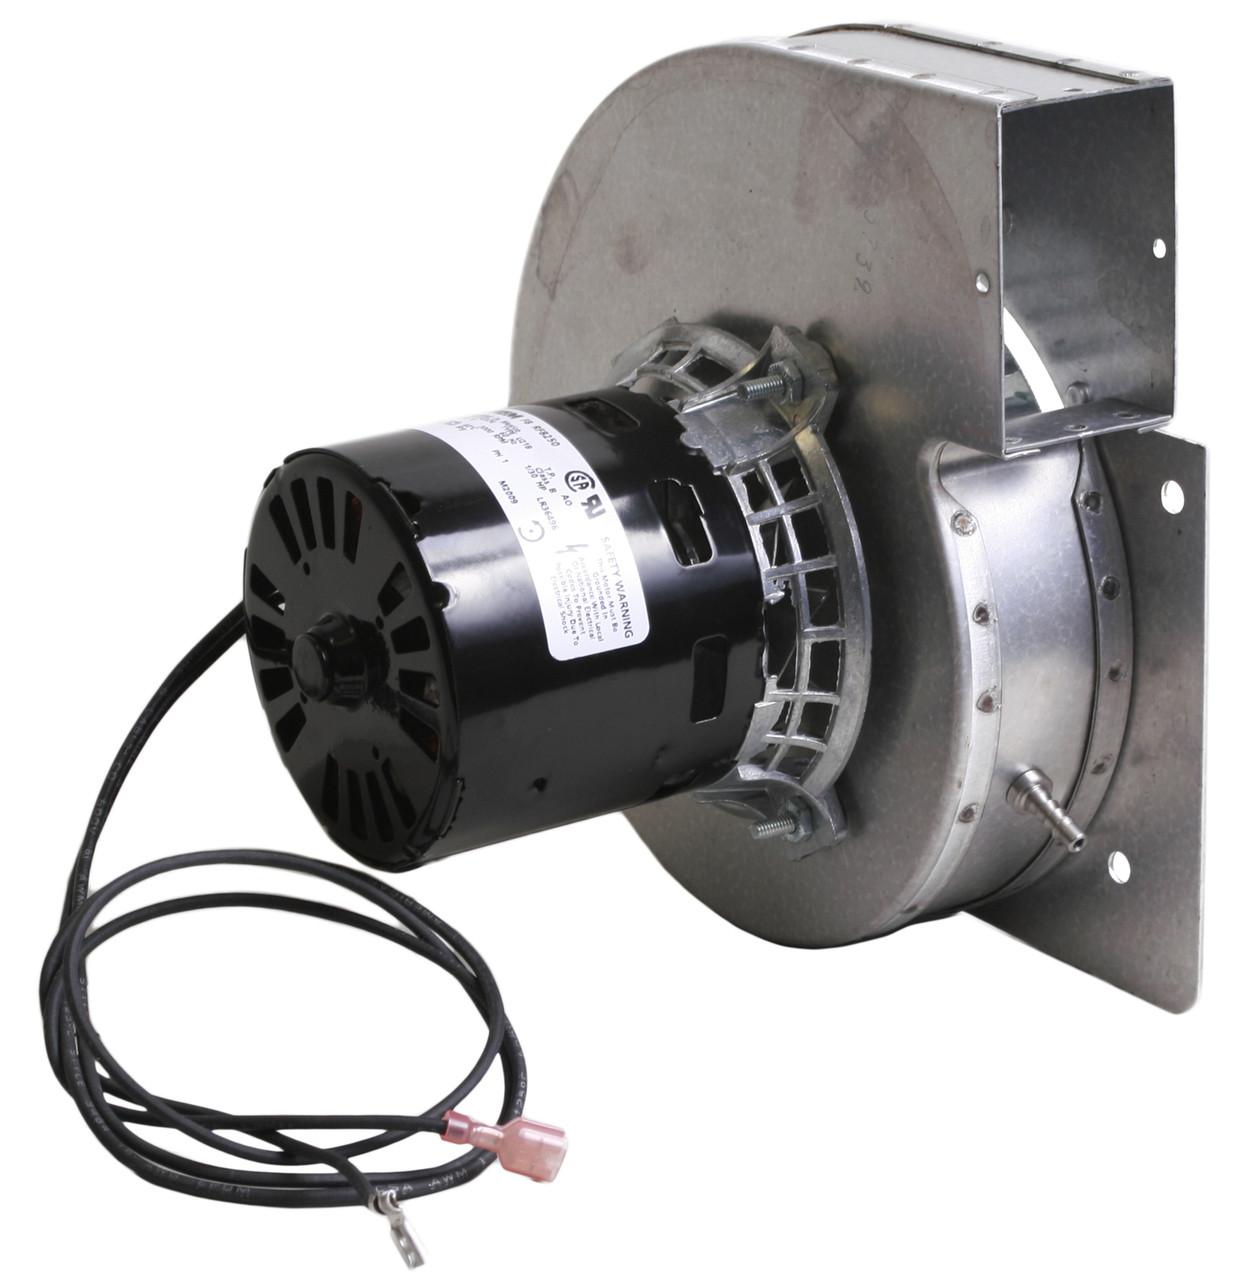 Furnace Blower Motors - Furnace Draft Inducers - Venter Motors